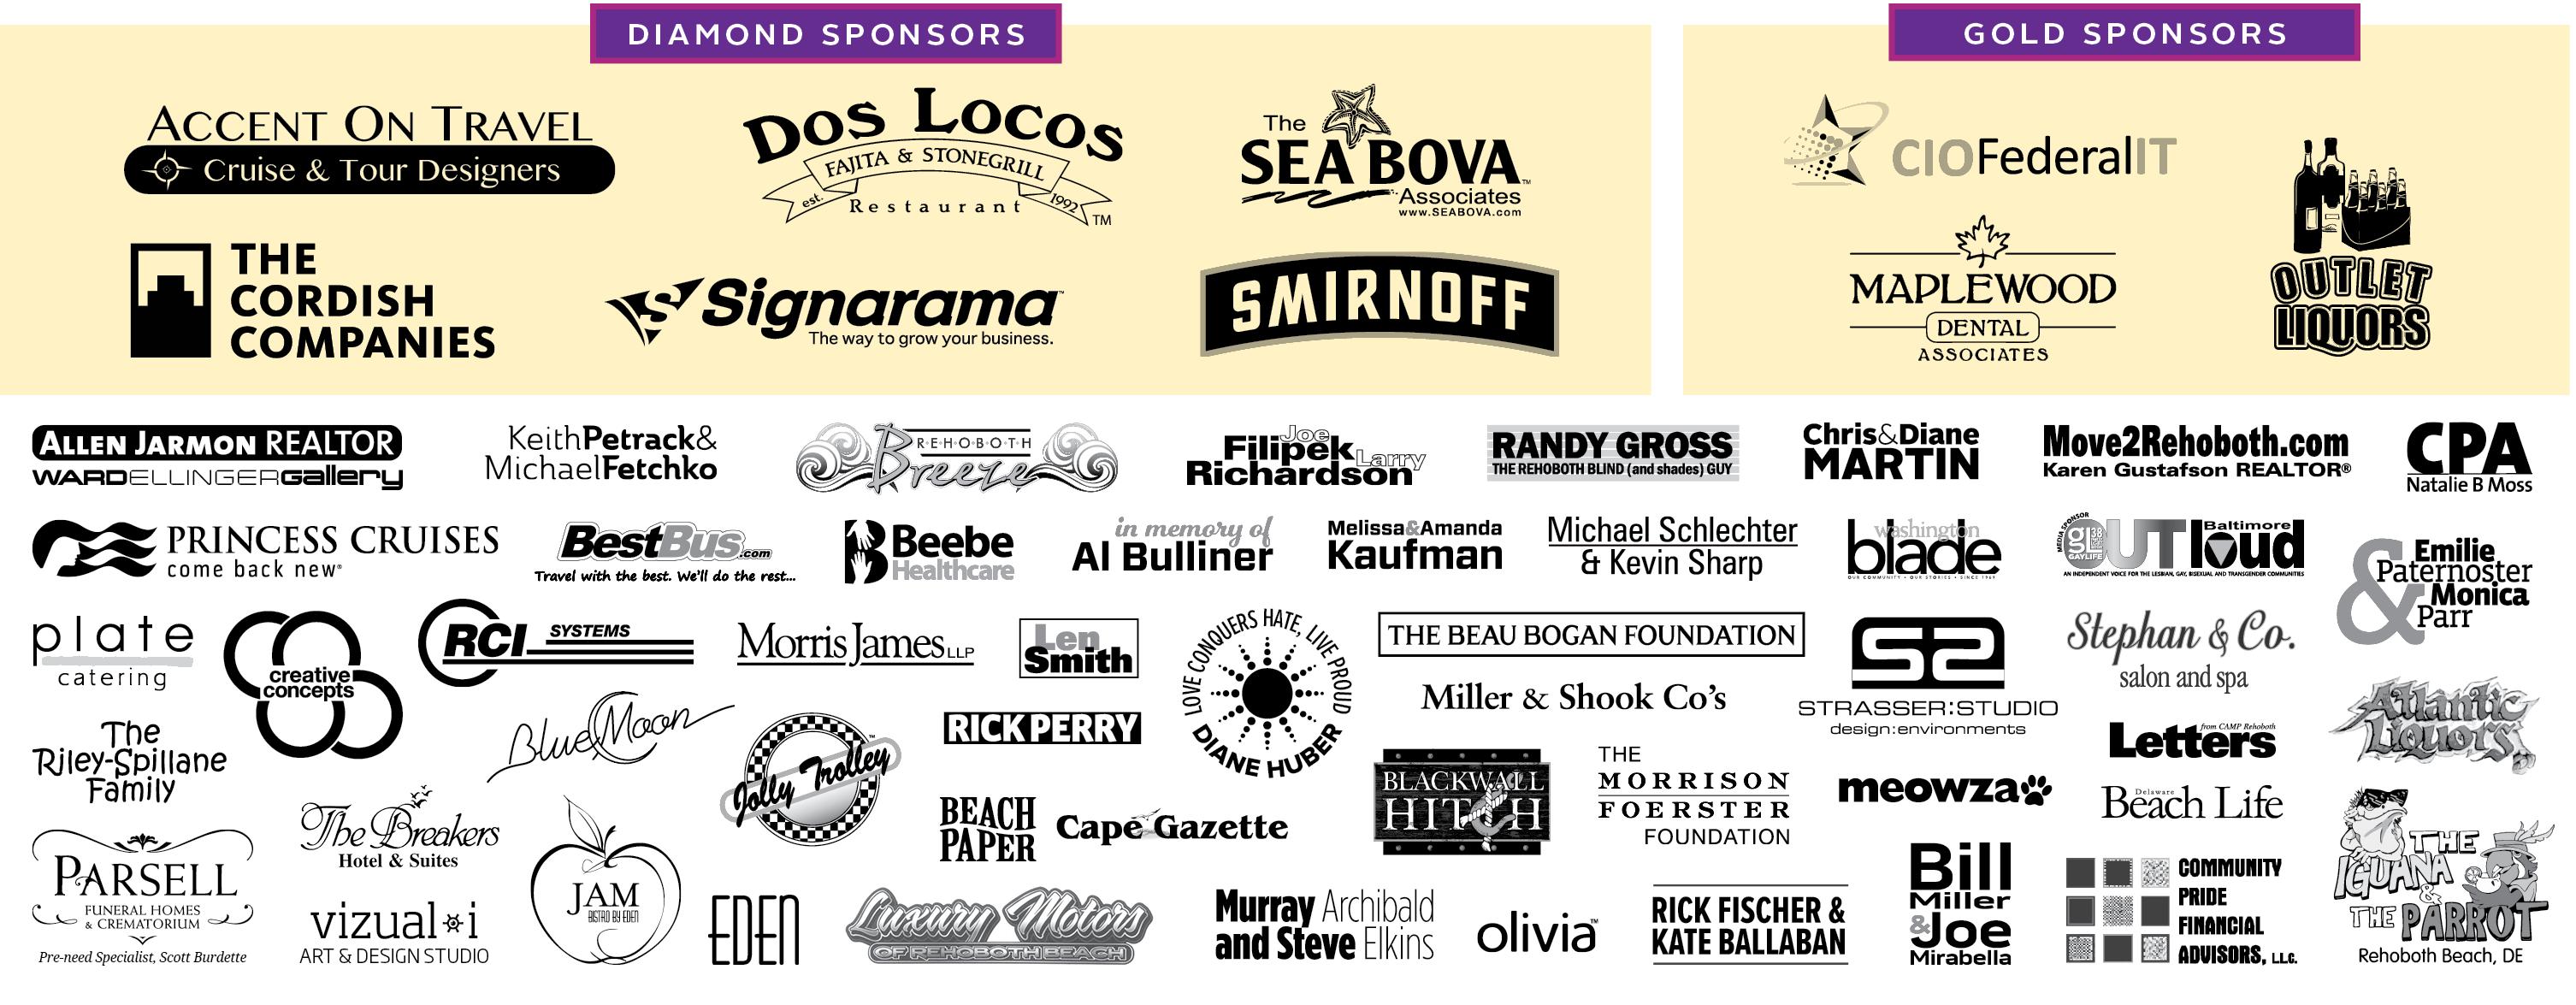 Sundance 2017 Sponsors